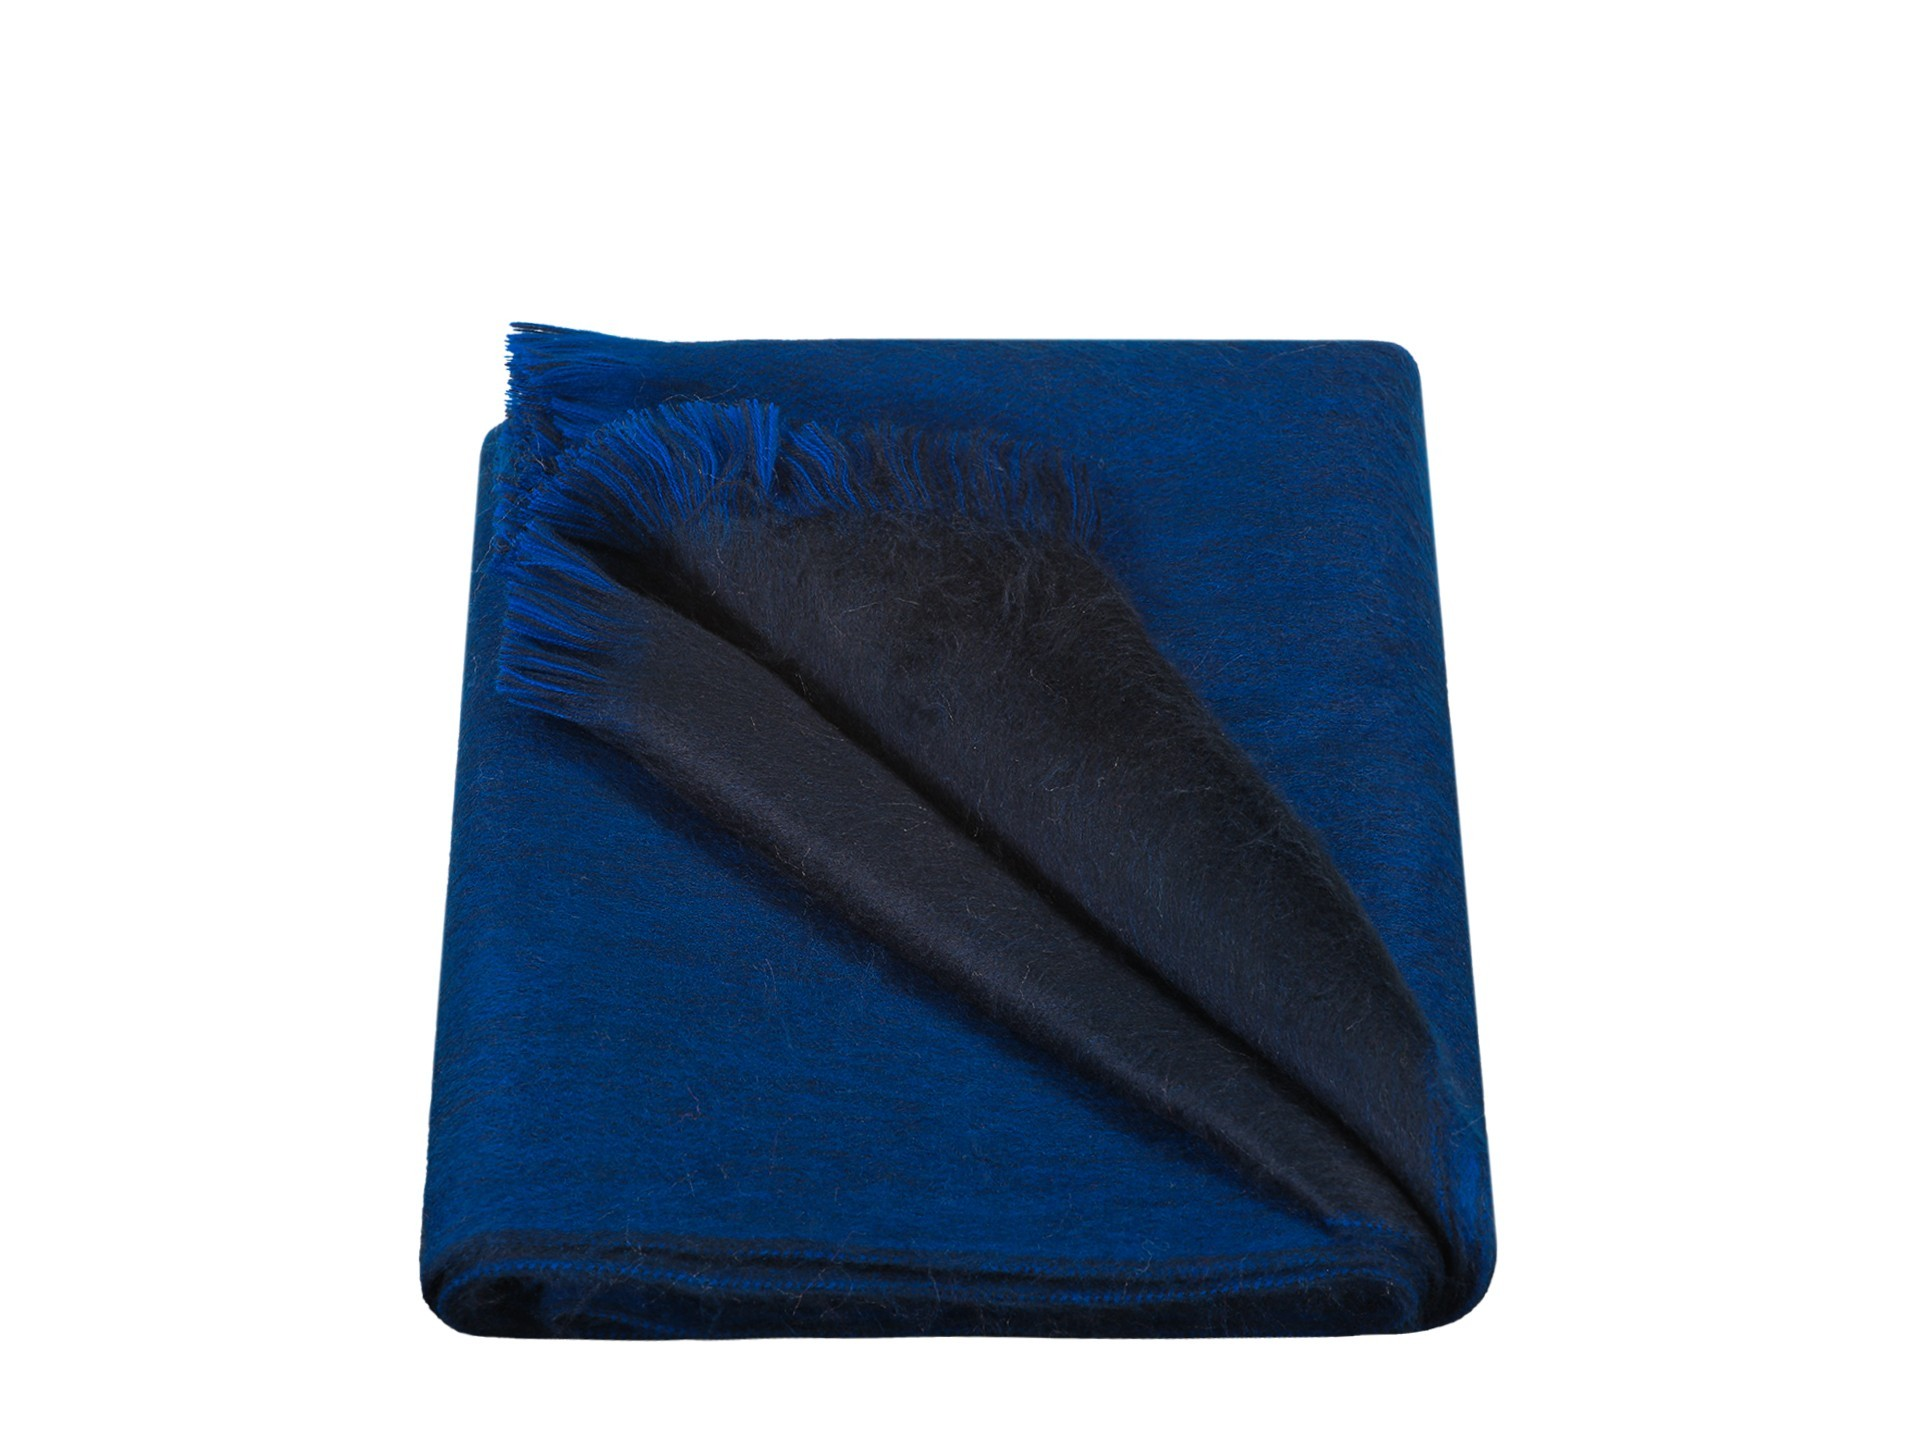 scarf double-shiny-blue-navy-blue